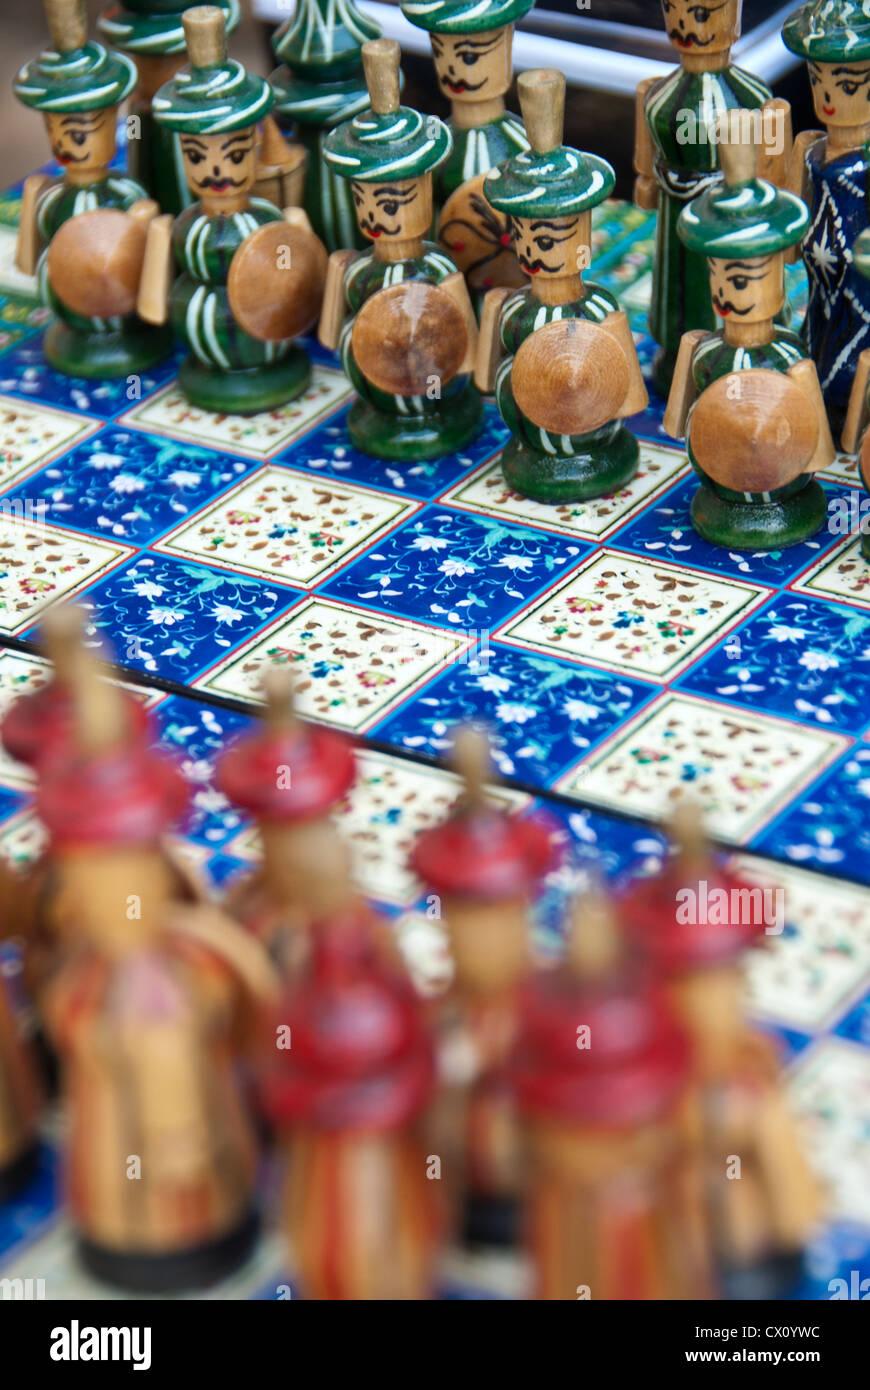 Handmade Chess game and Pieces, Samarkand, Uzbekistan Stock Photo